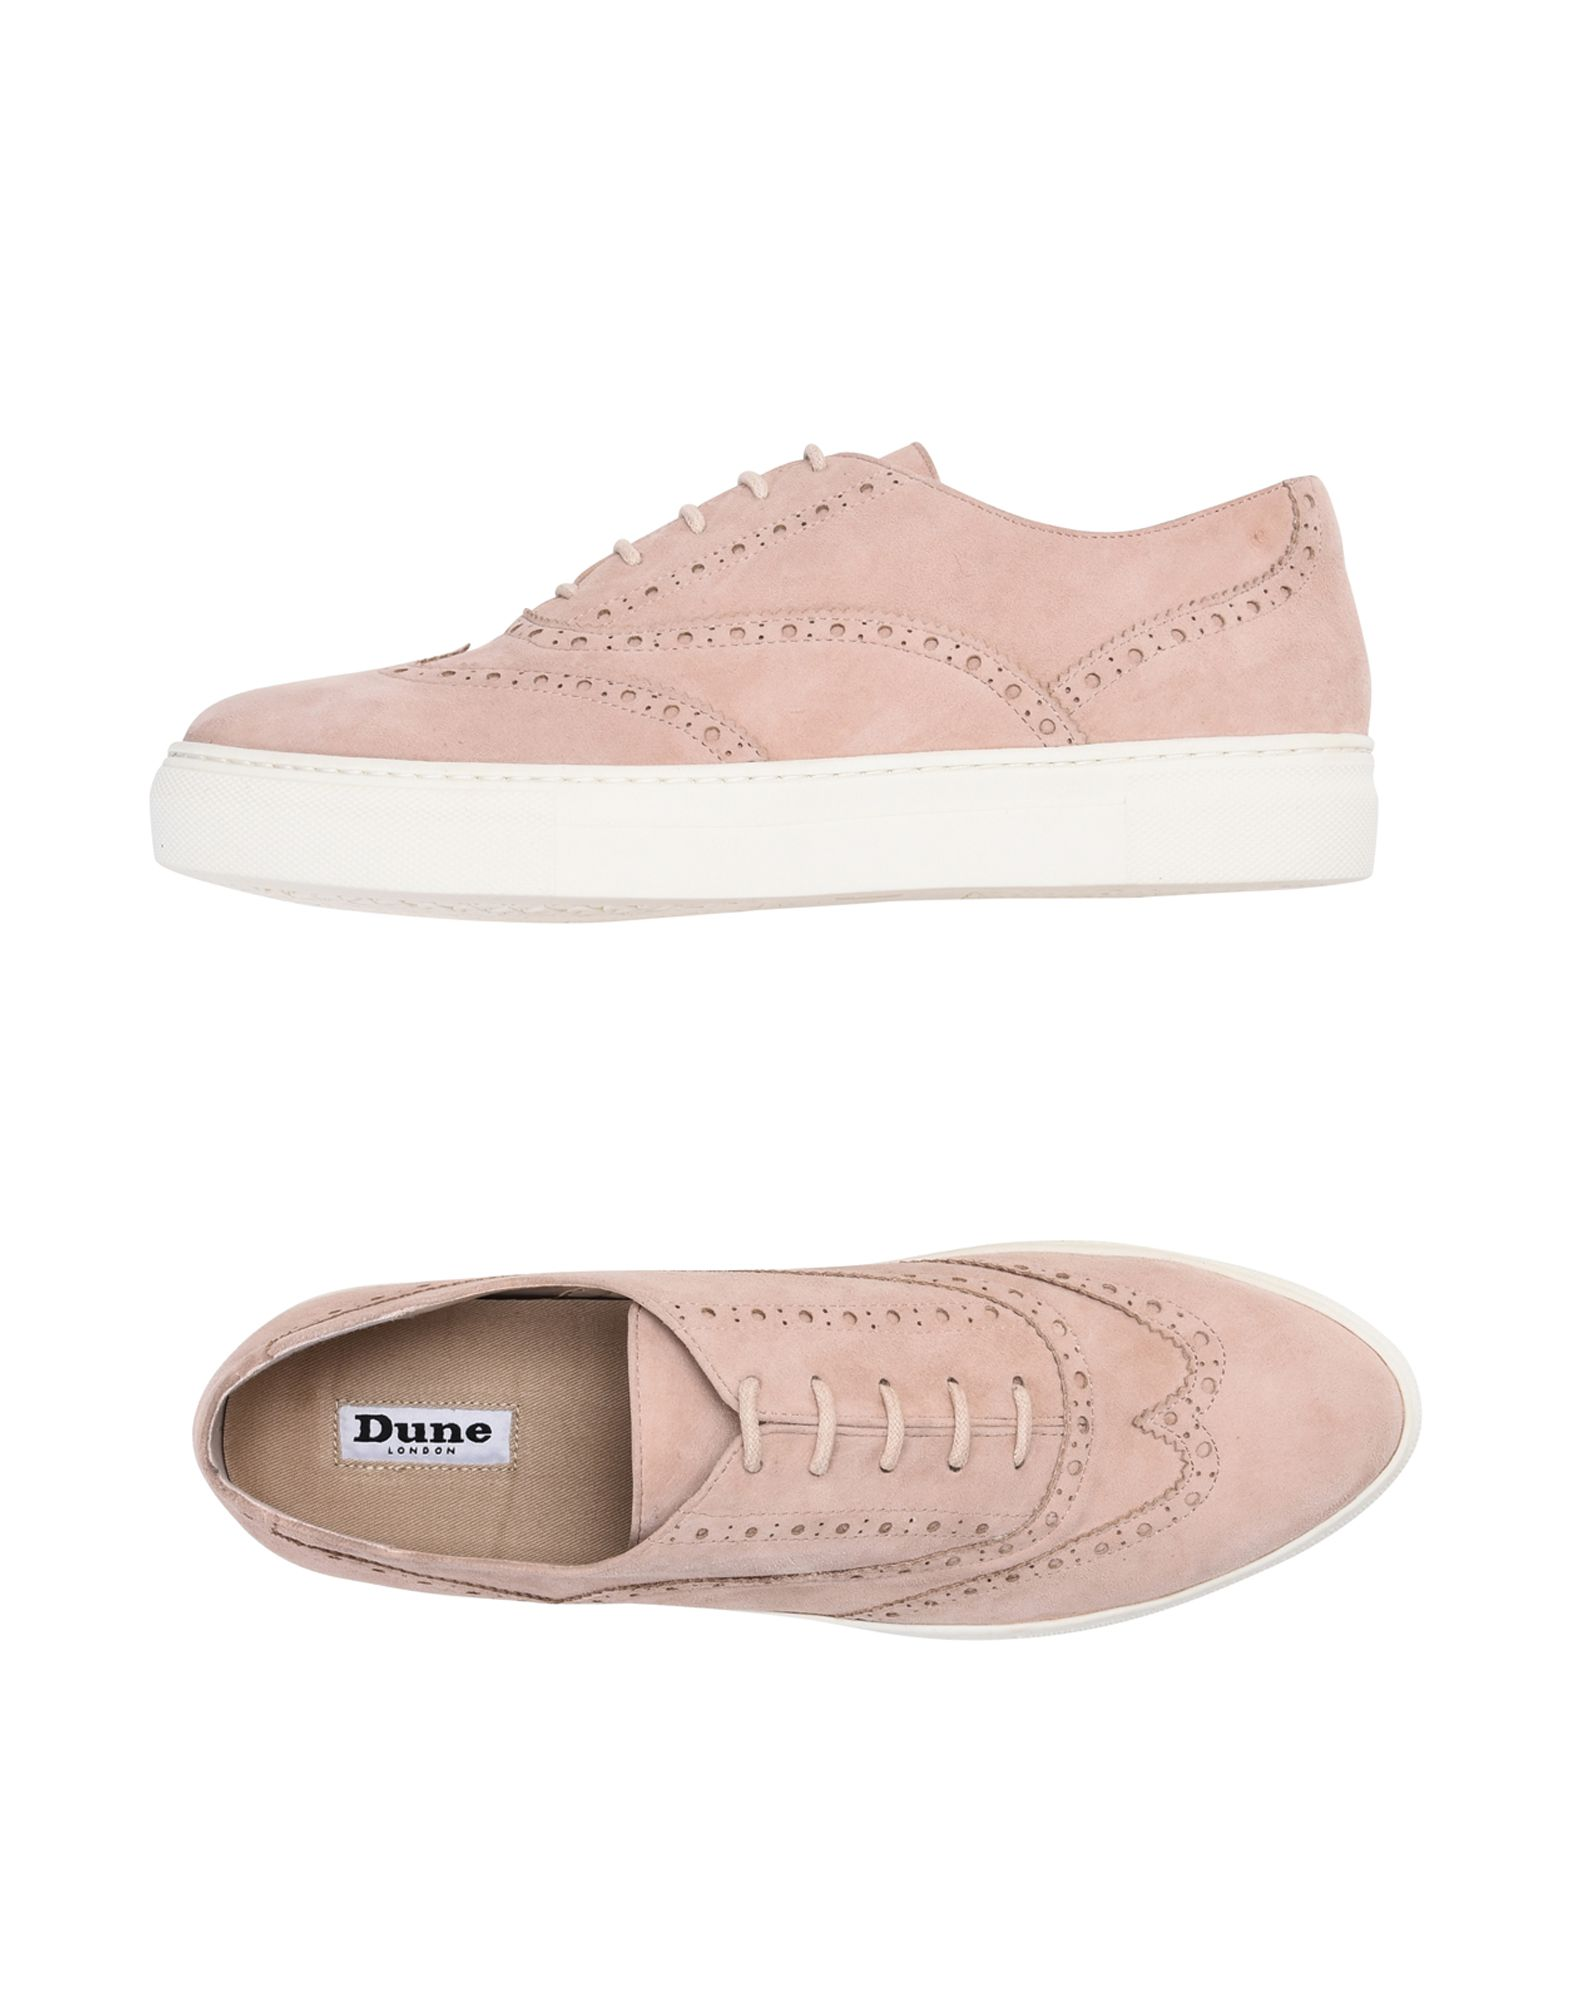 Sneakers Dune London Brogue Detail Trainer - Donna - Acquista online su